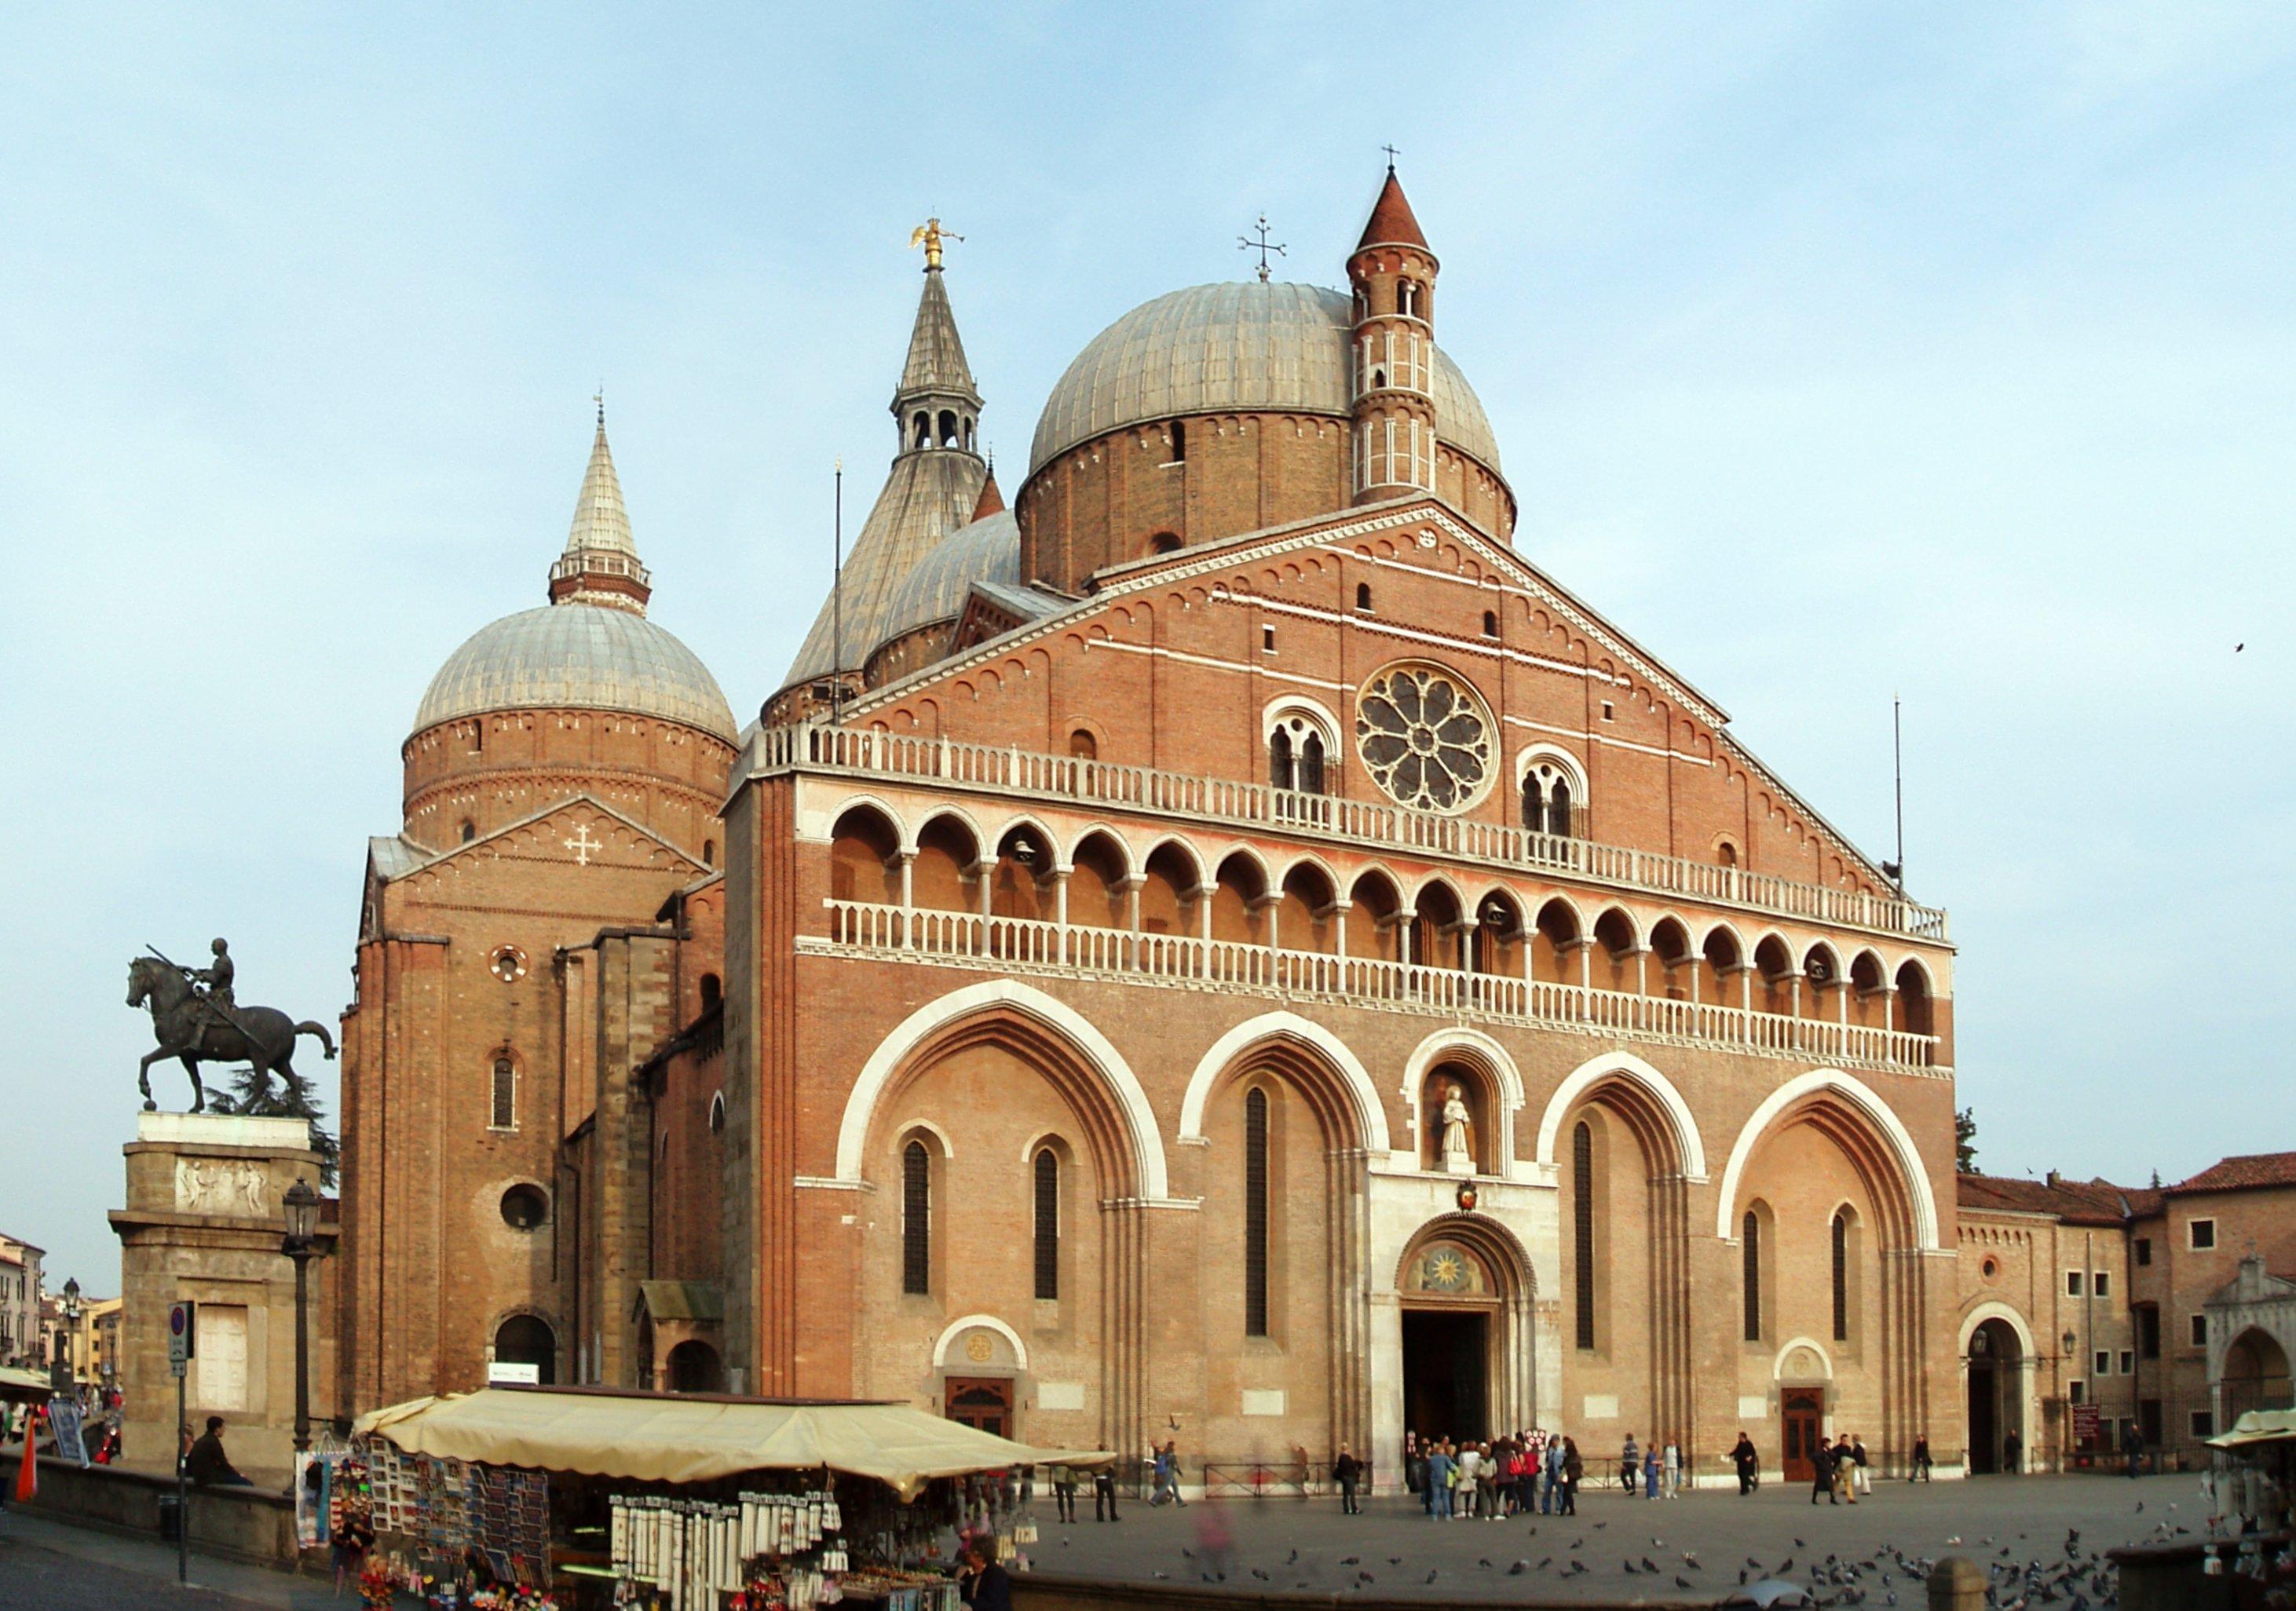 Basilica_di_SantAntonio_da_Padova.jpg